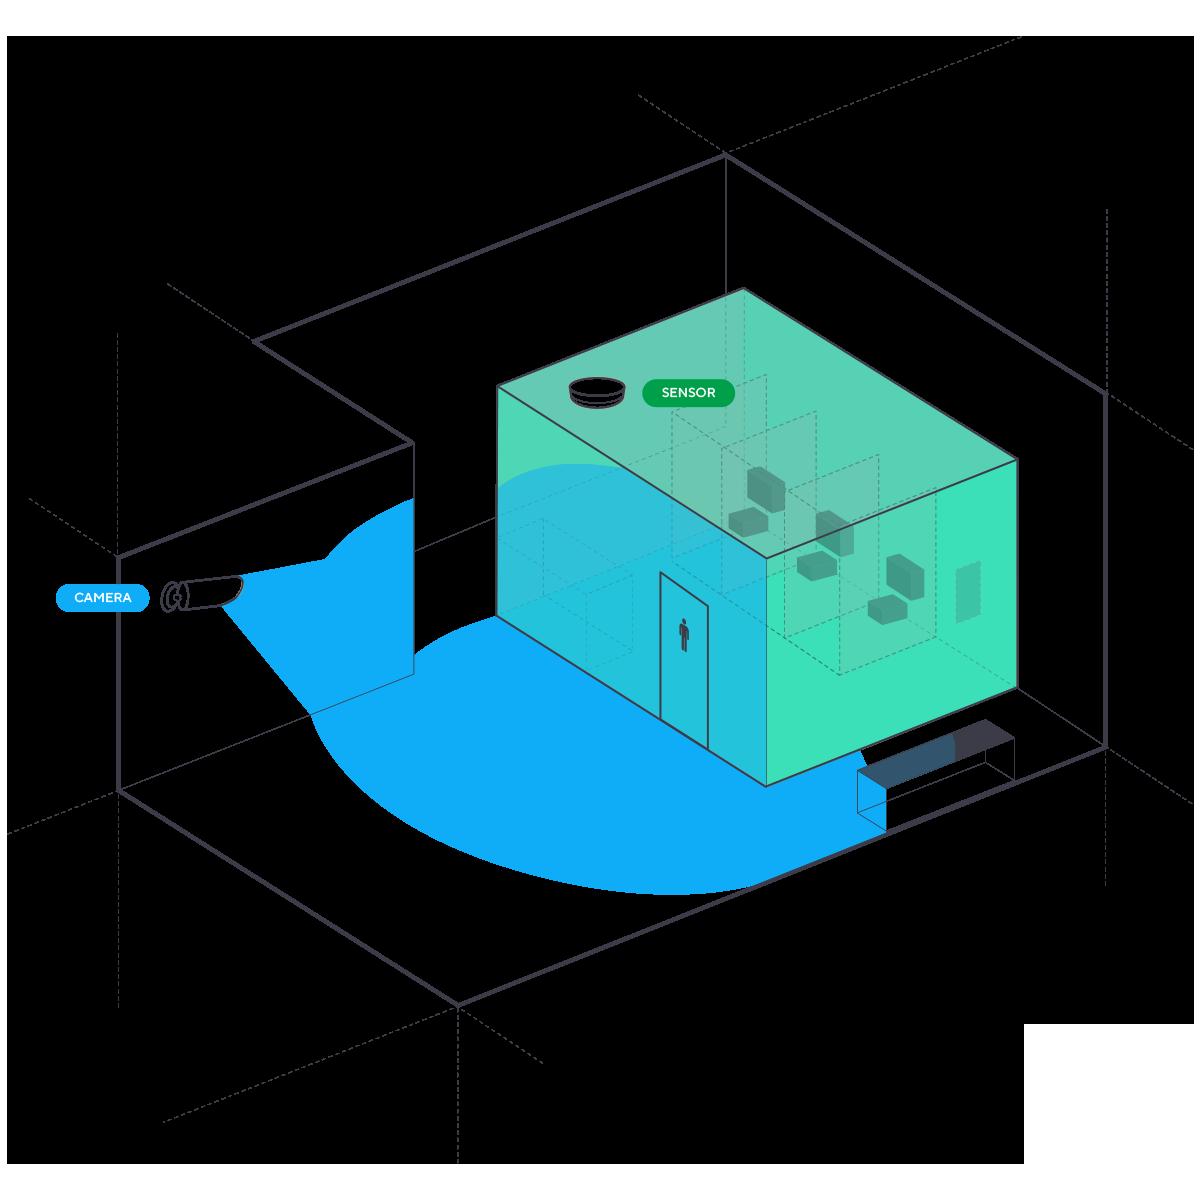 vape_sensor_camera_system